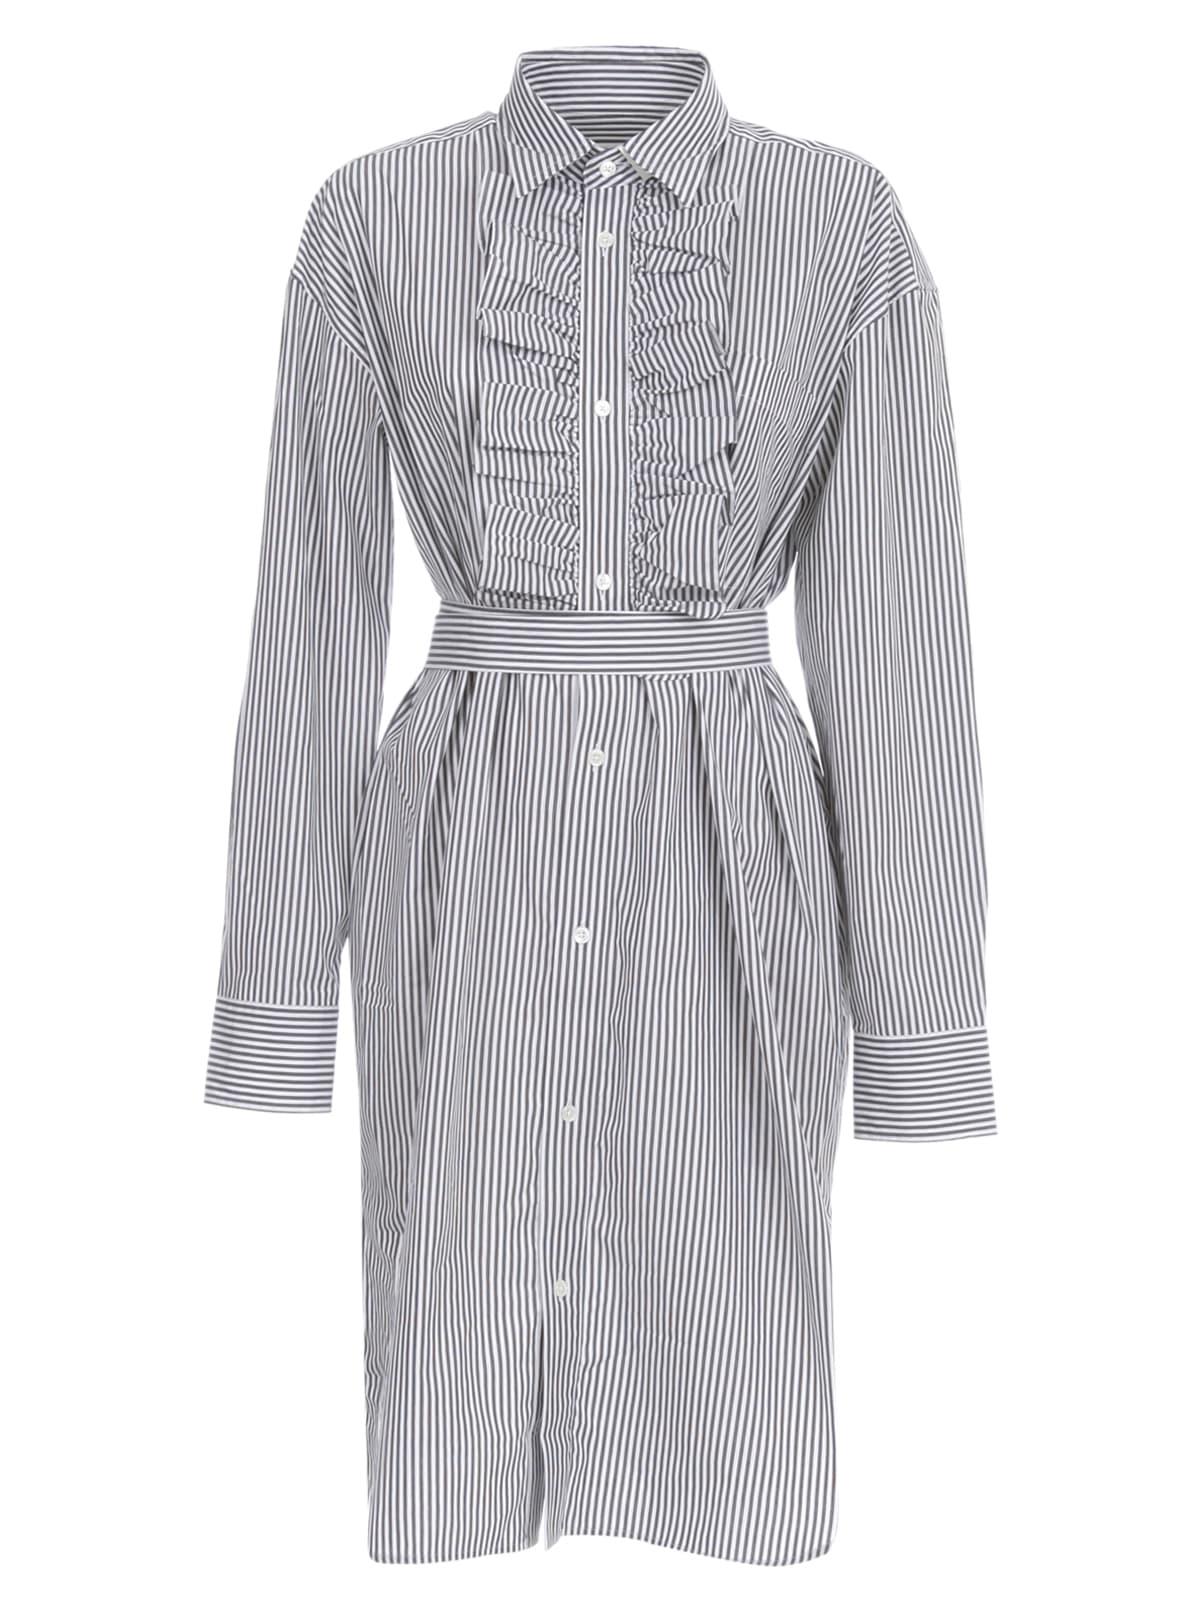 Buy Essentiel Antwerp Vike Popeline Dress L/s Shirt Collar online, shop Essentiel Antwerp with free shipping